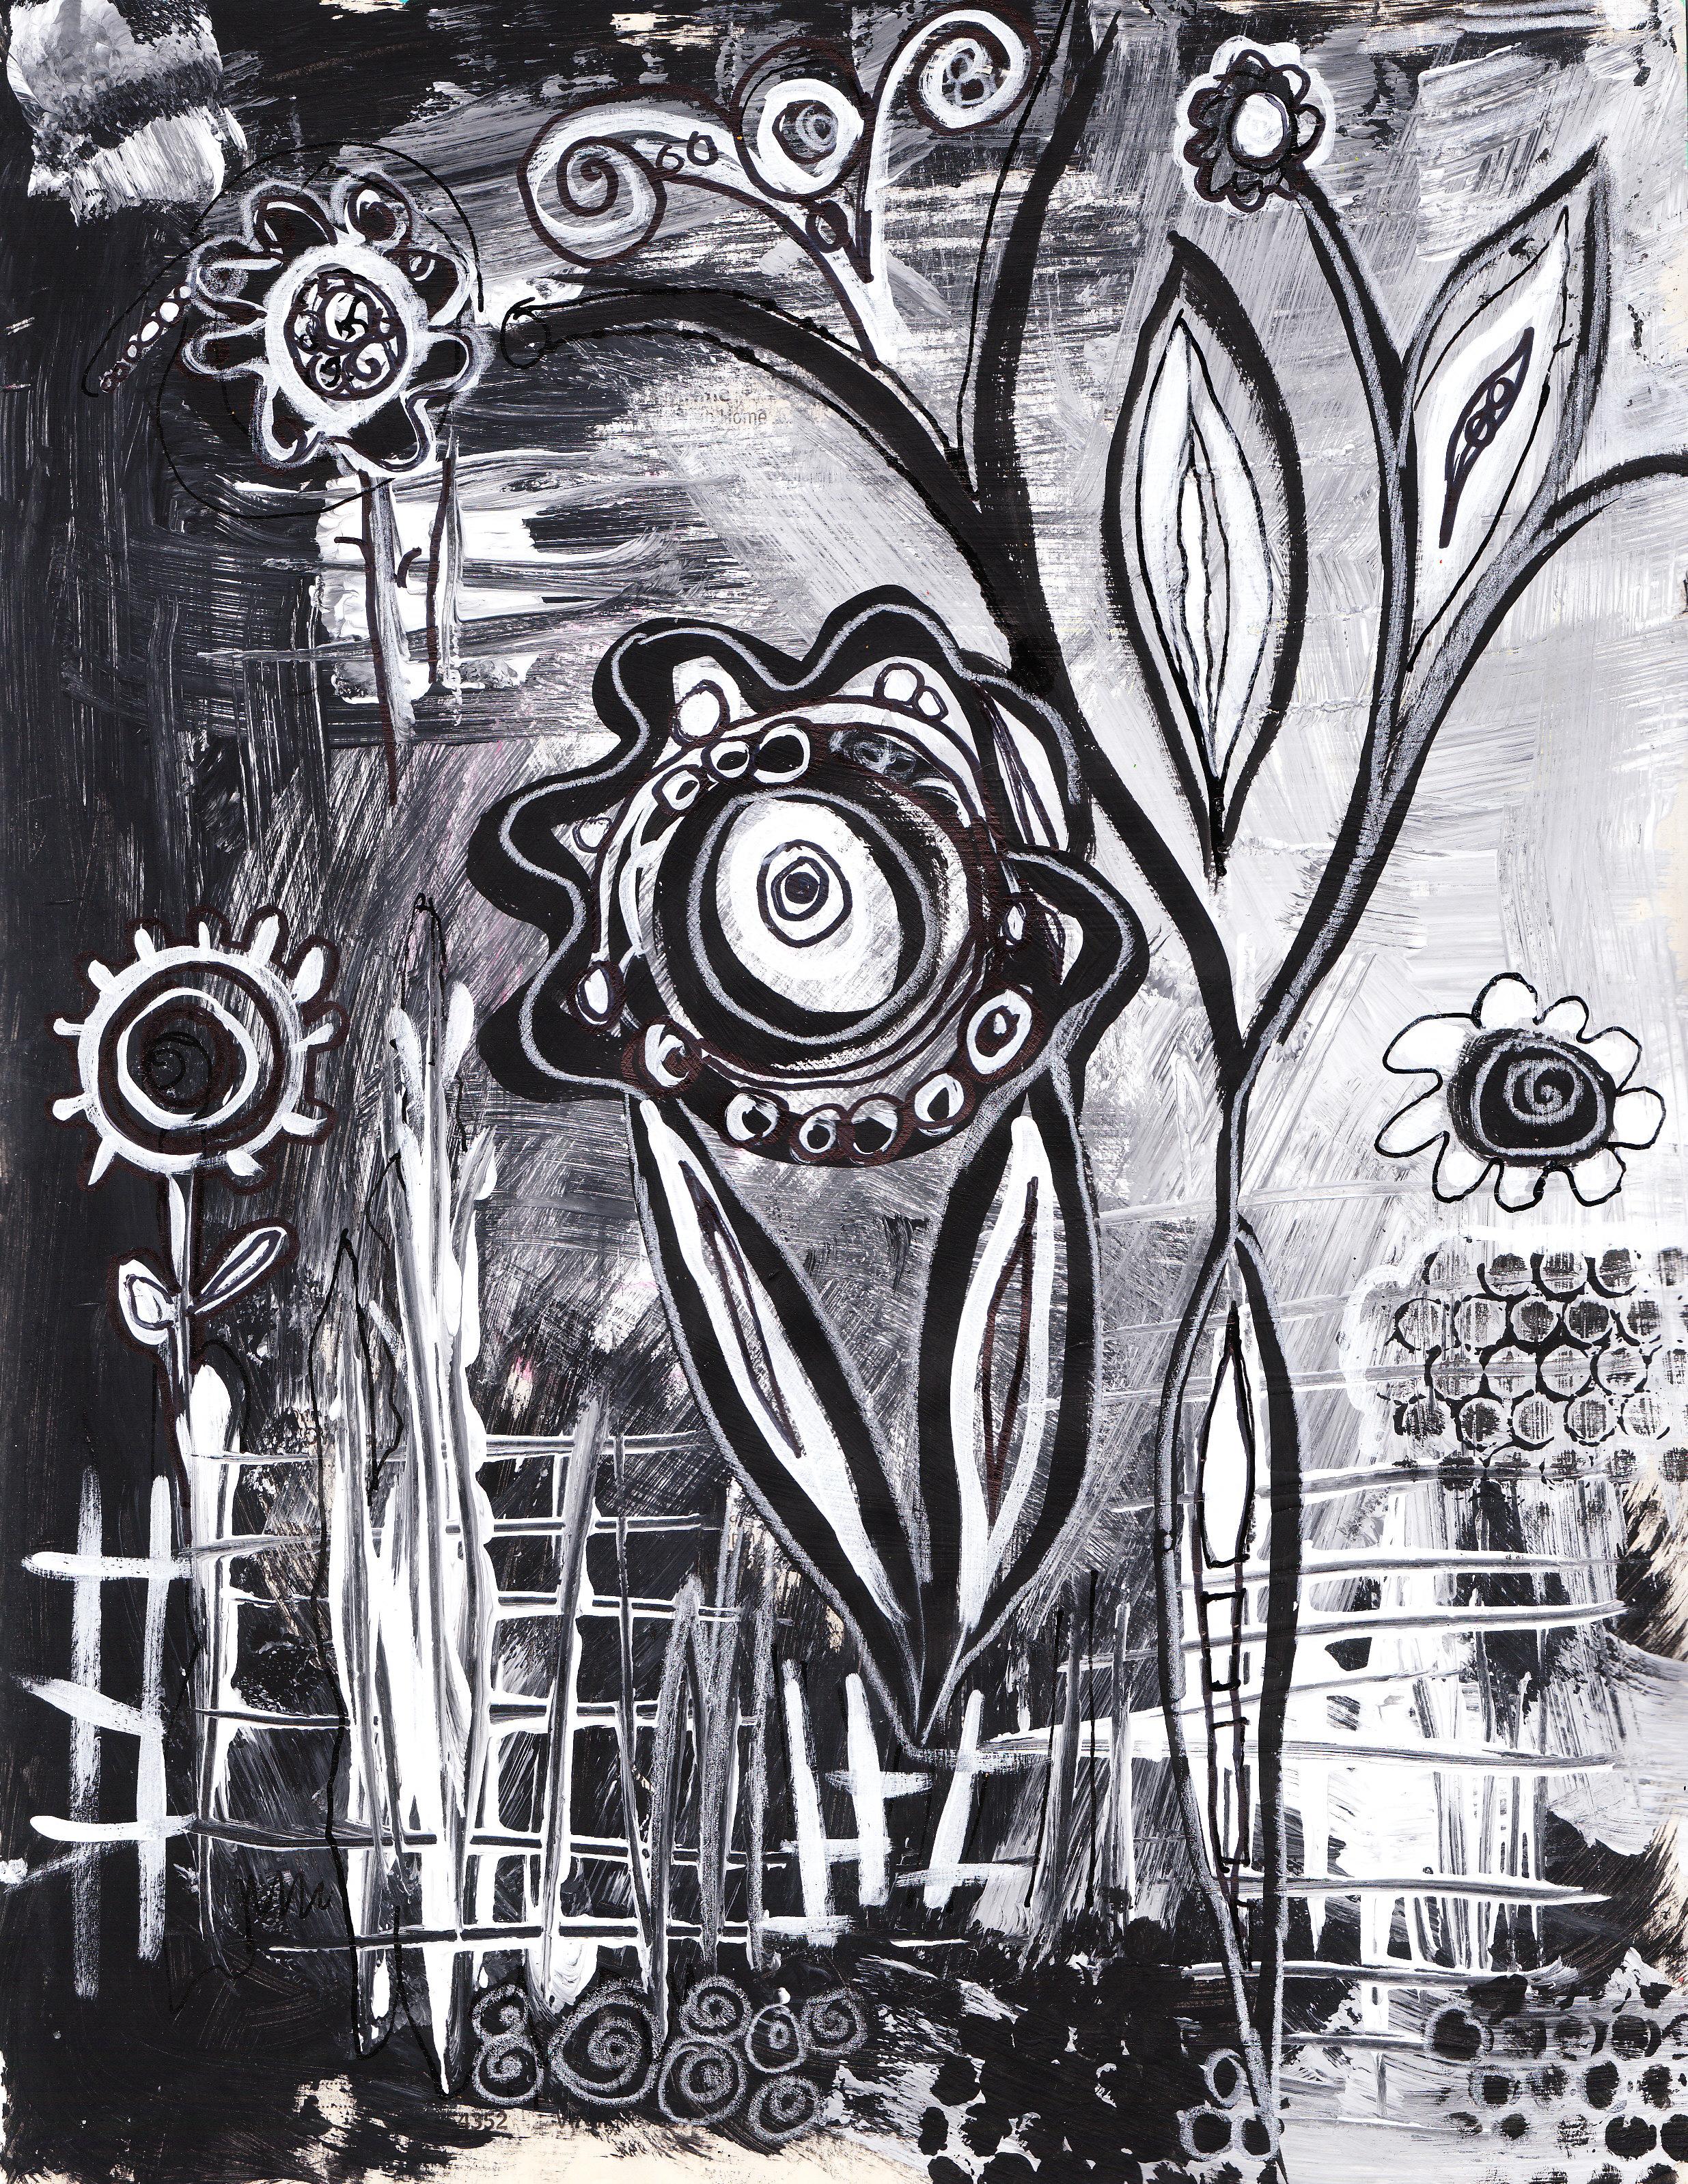 Black White And Journal 17 Joyful Ploys